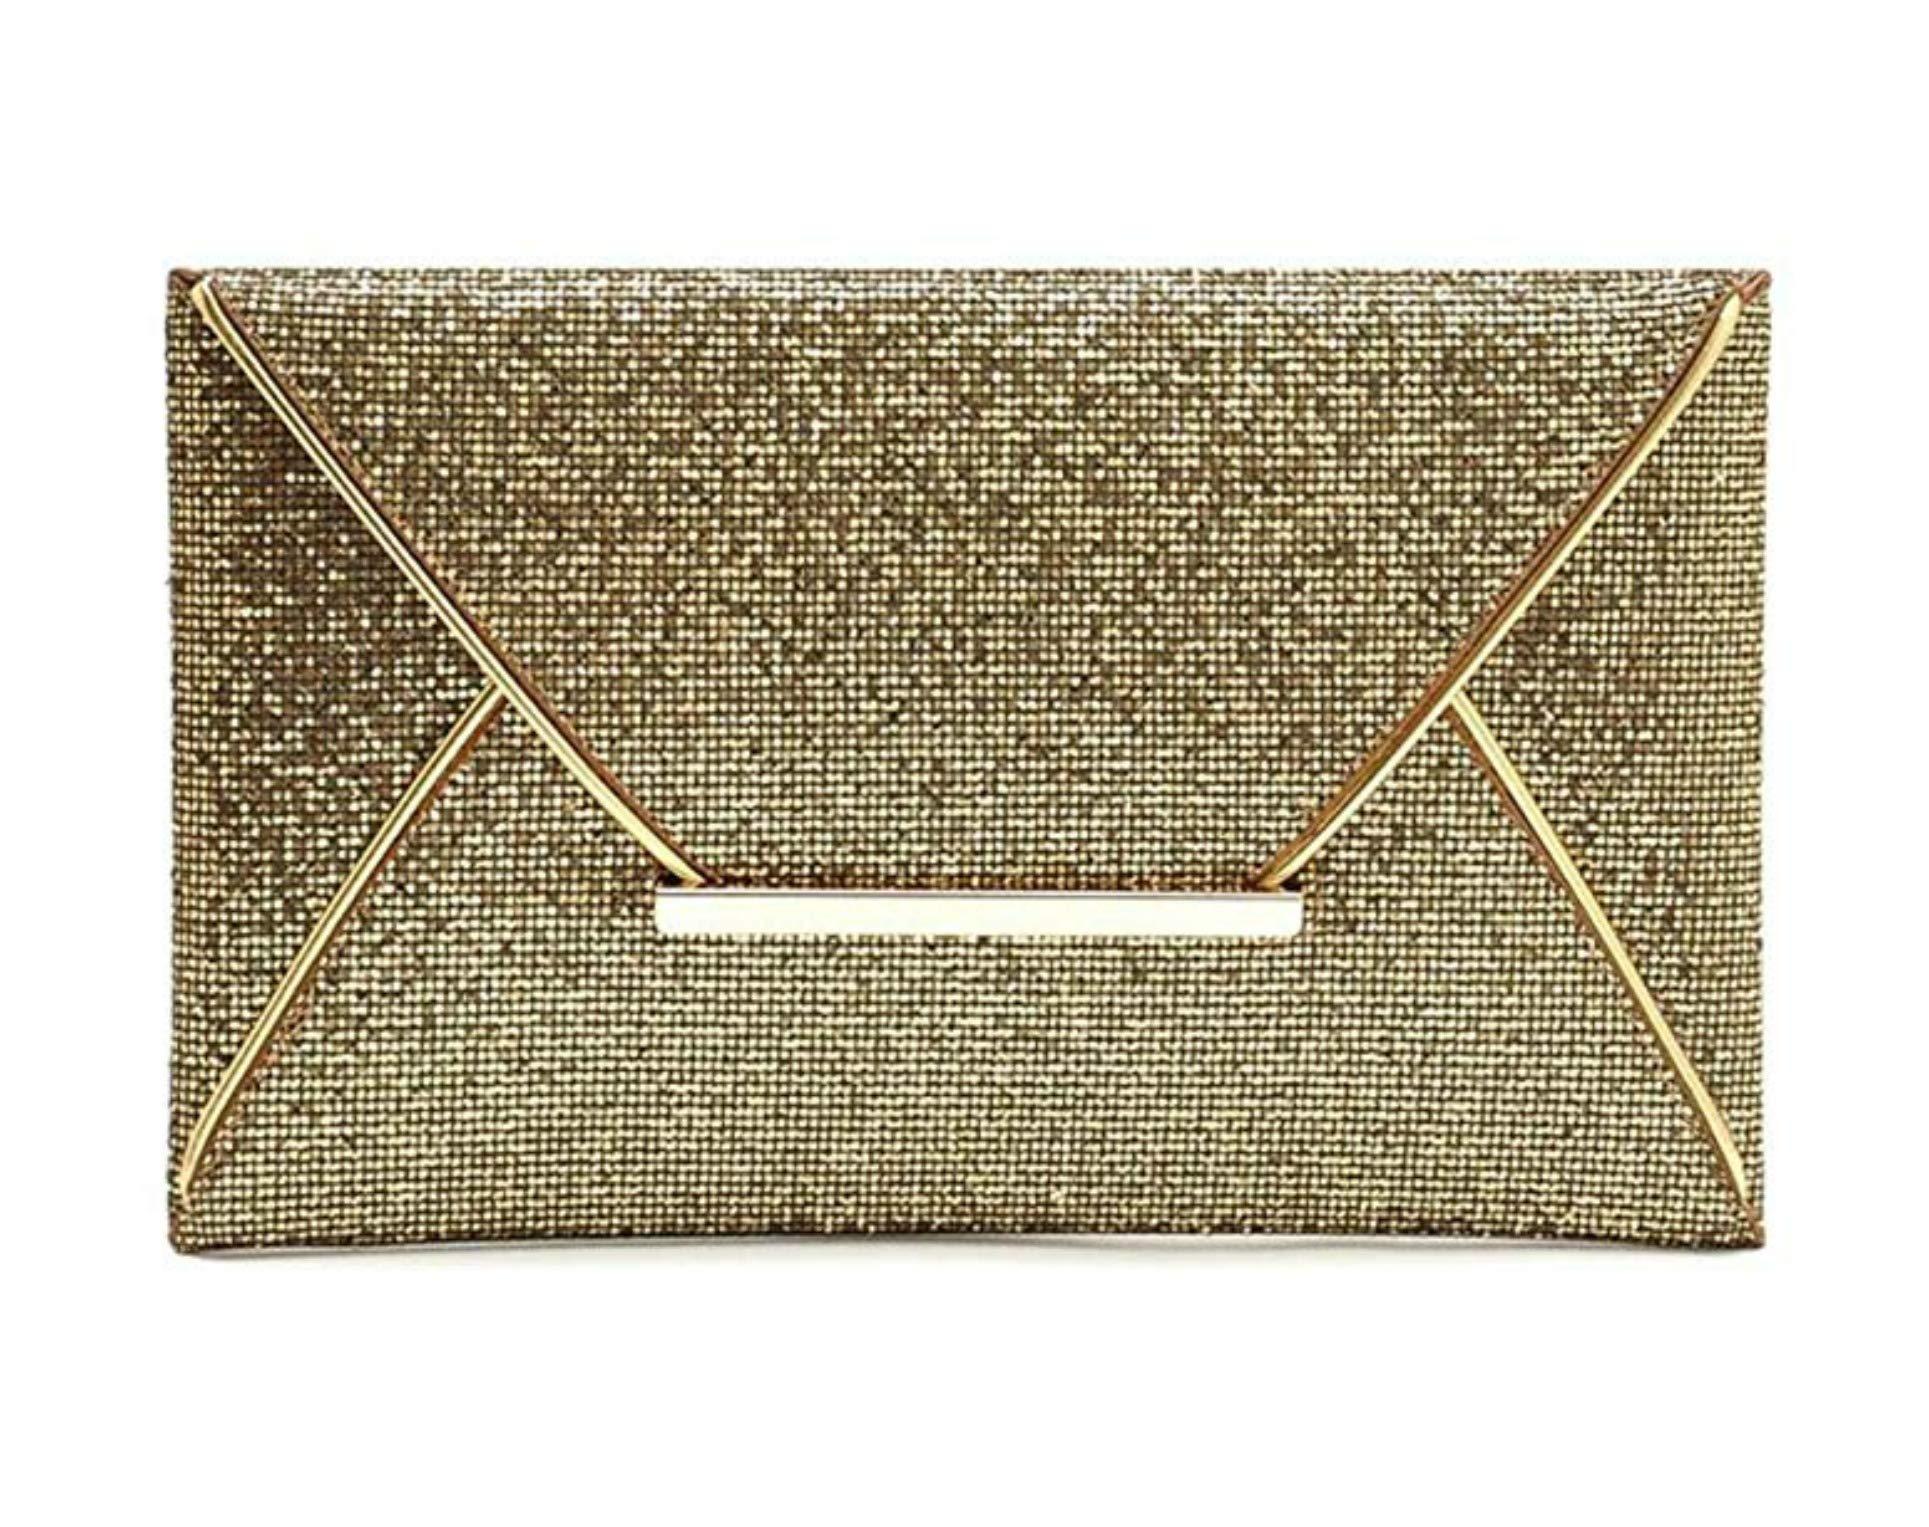 MidnightGirls Fashion Glitter Sequin Envelope Clutch Purse Handbag For Women (Gold)